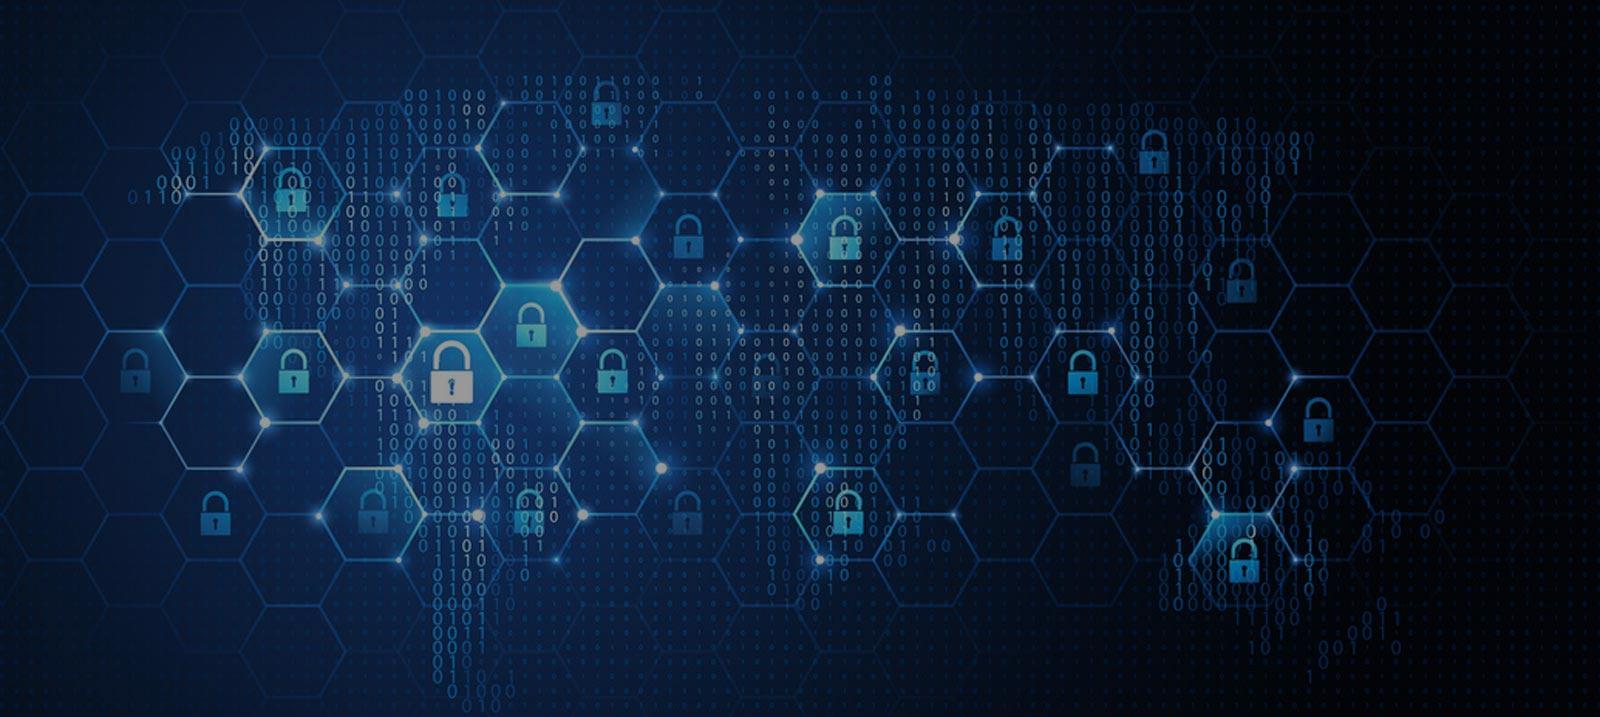 bg_cybersecurity17